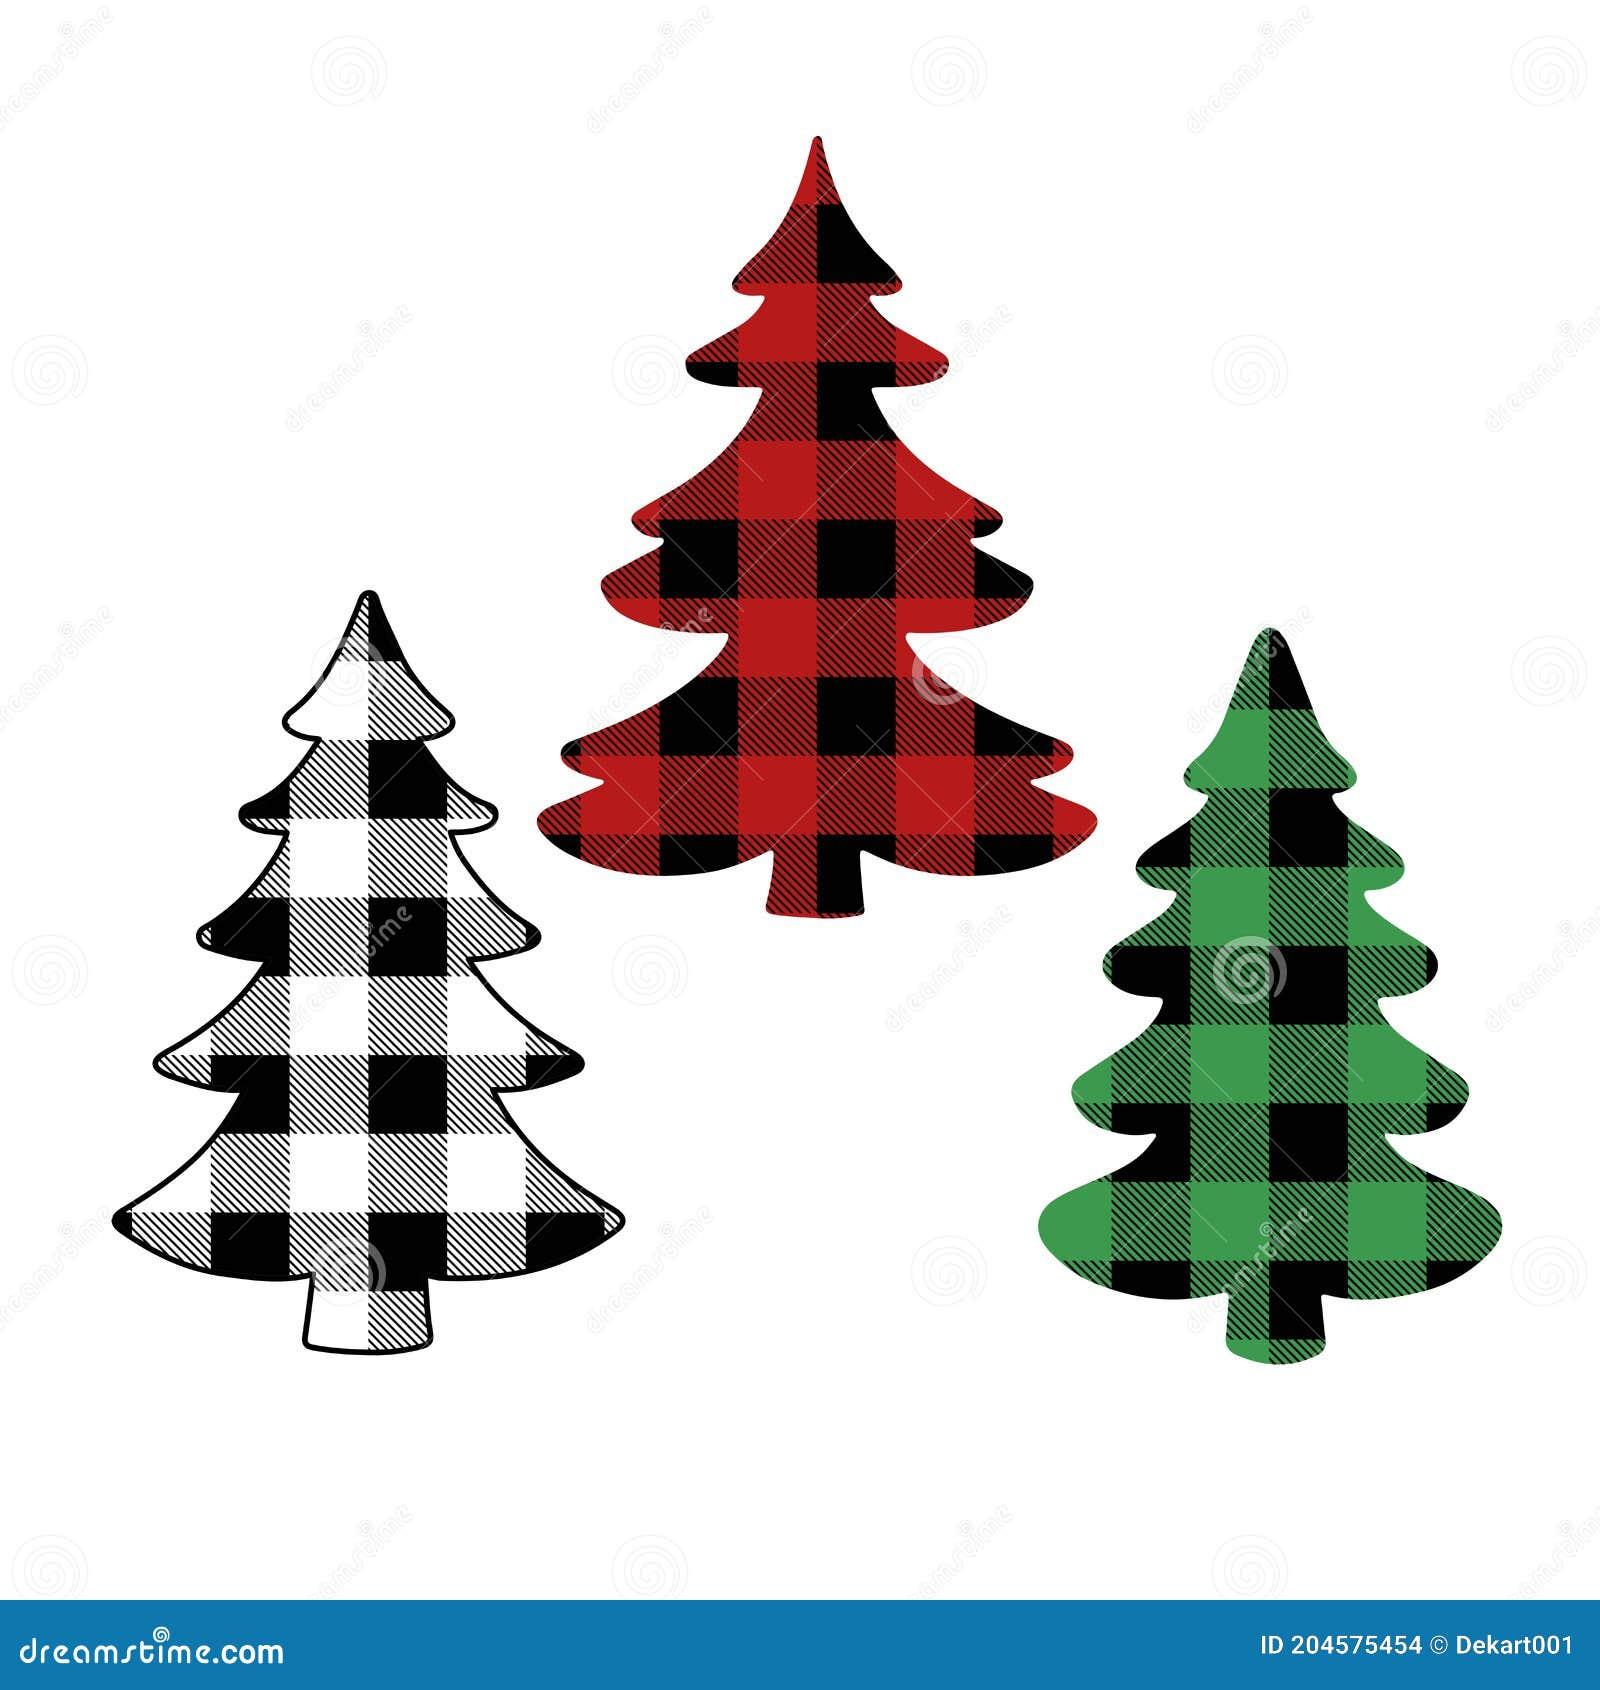 Christmas Buffalo Plaid Stock Illustrations 3 525 Christmas Buffalo Plaid Stock Illustrations Vectors Clipart Dreamstime